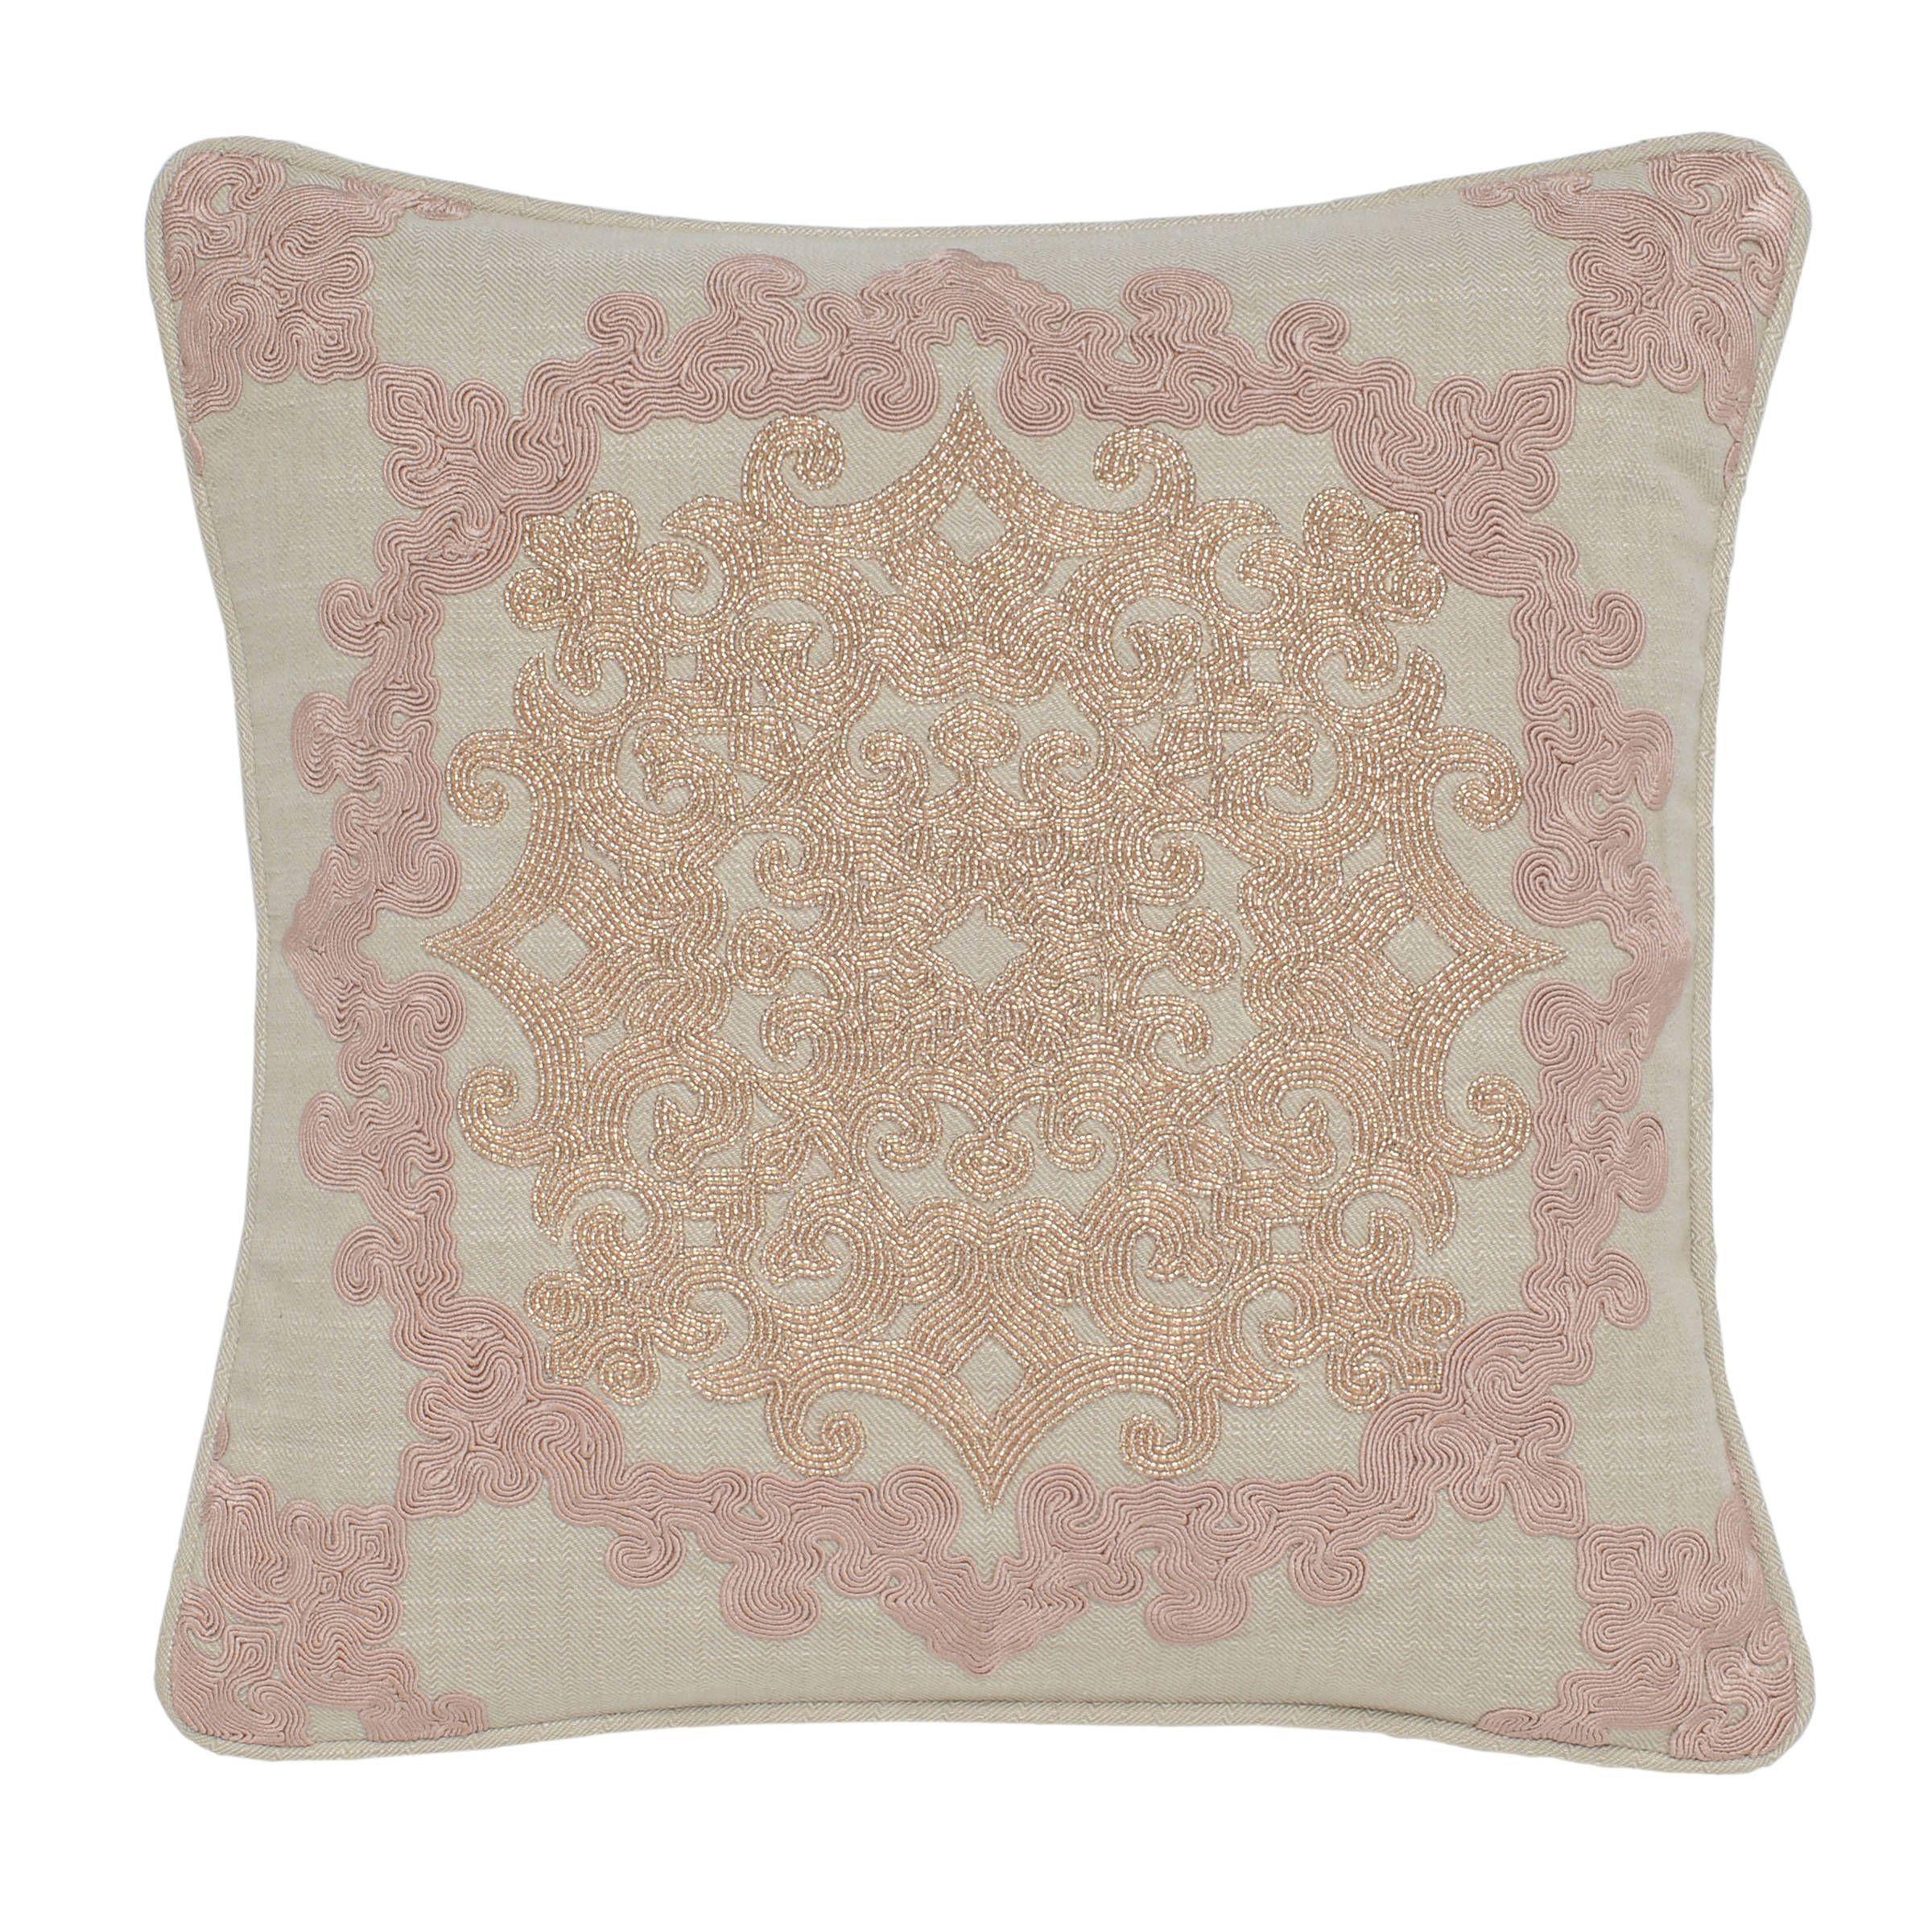 Kosas Home Vivian Pink Blush Cotton Hand Beaded 18 Inch Square